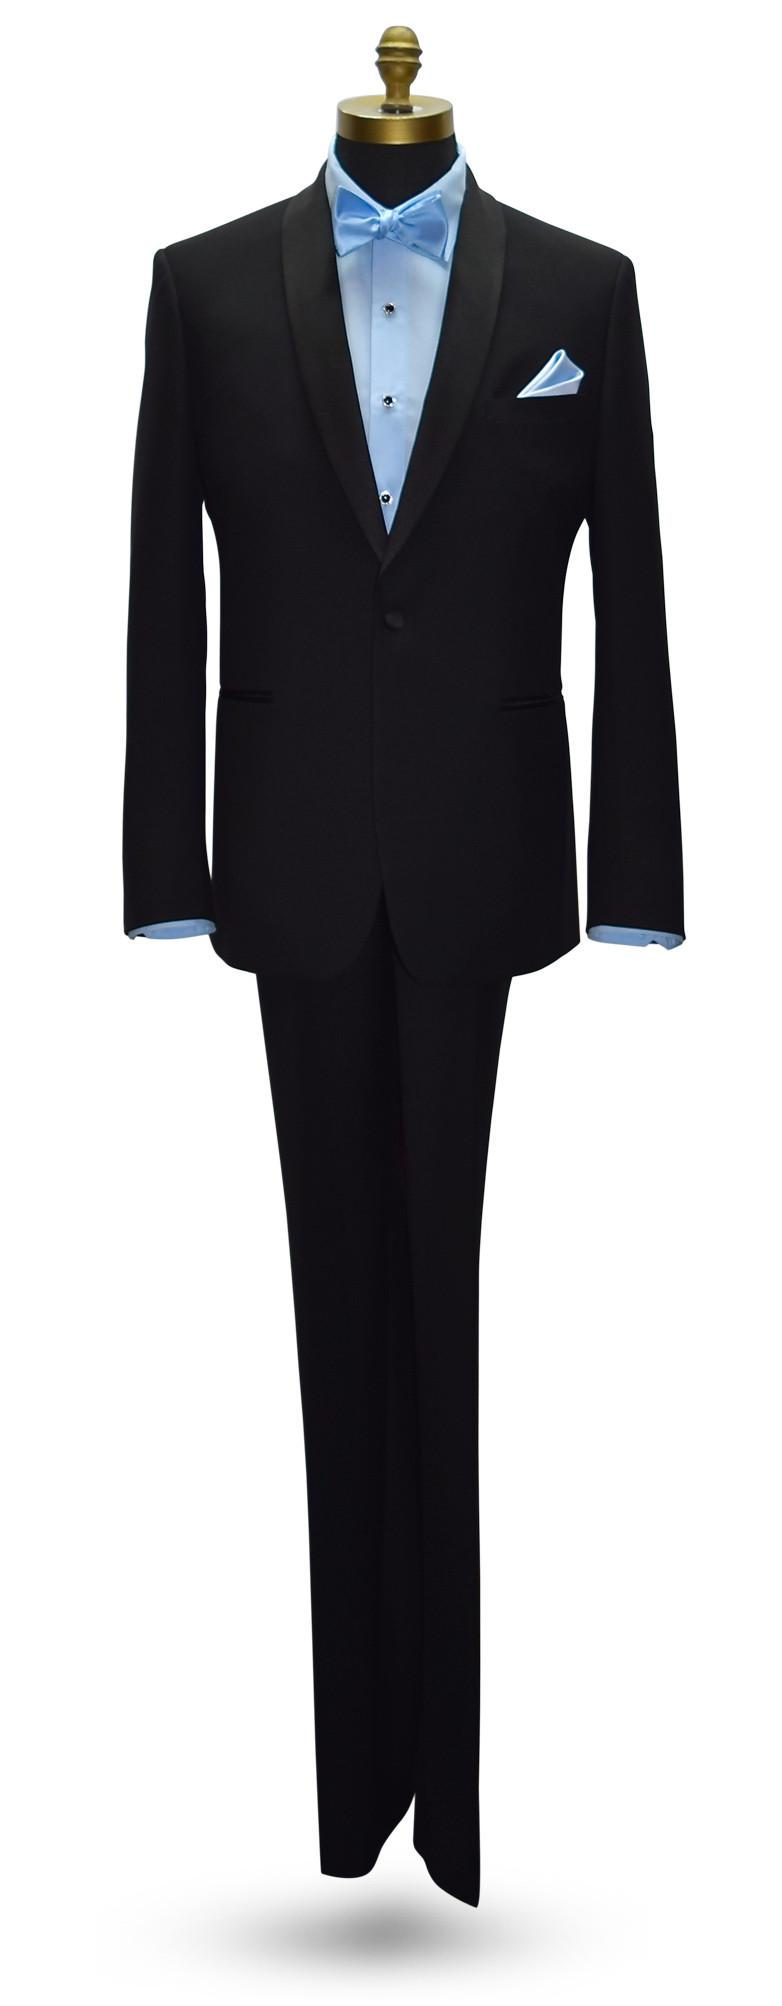 blue tuxedo shirt with blue bowtie